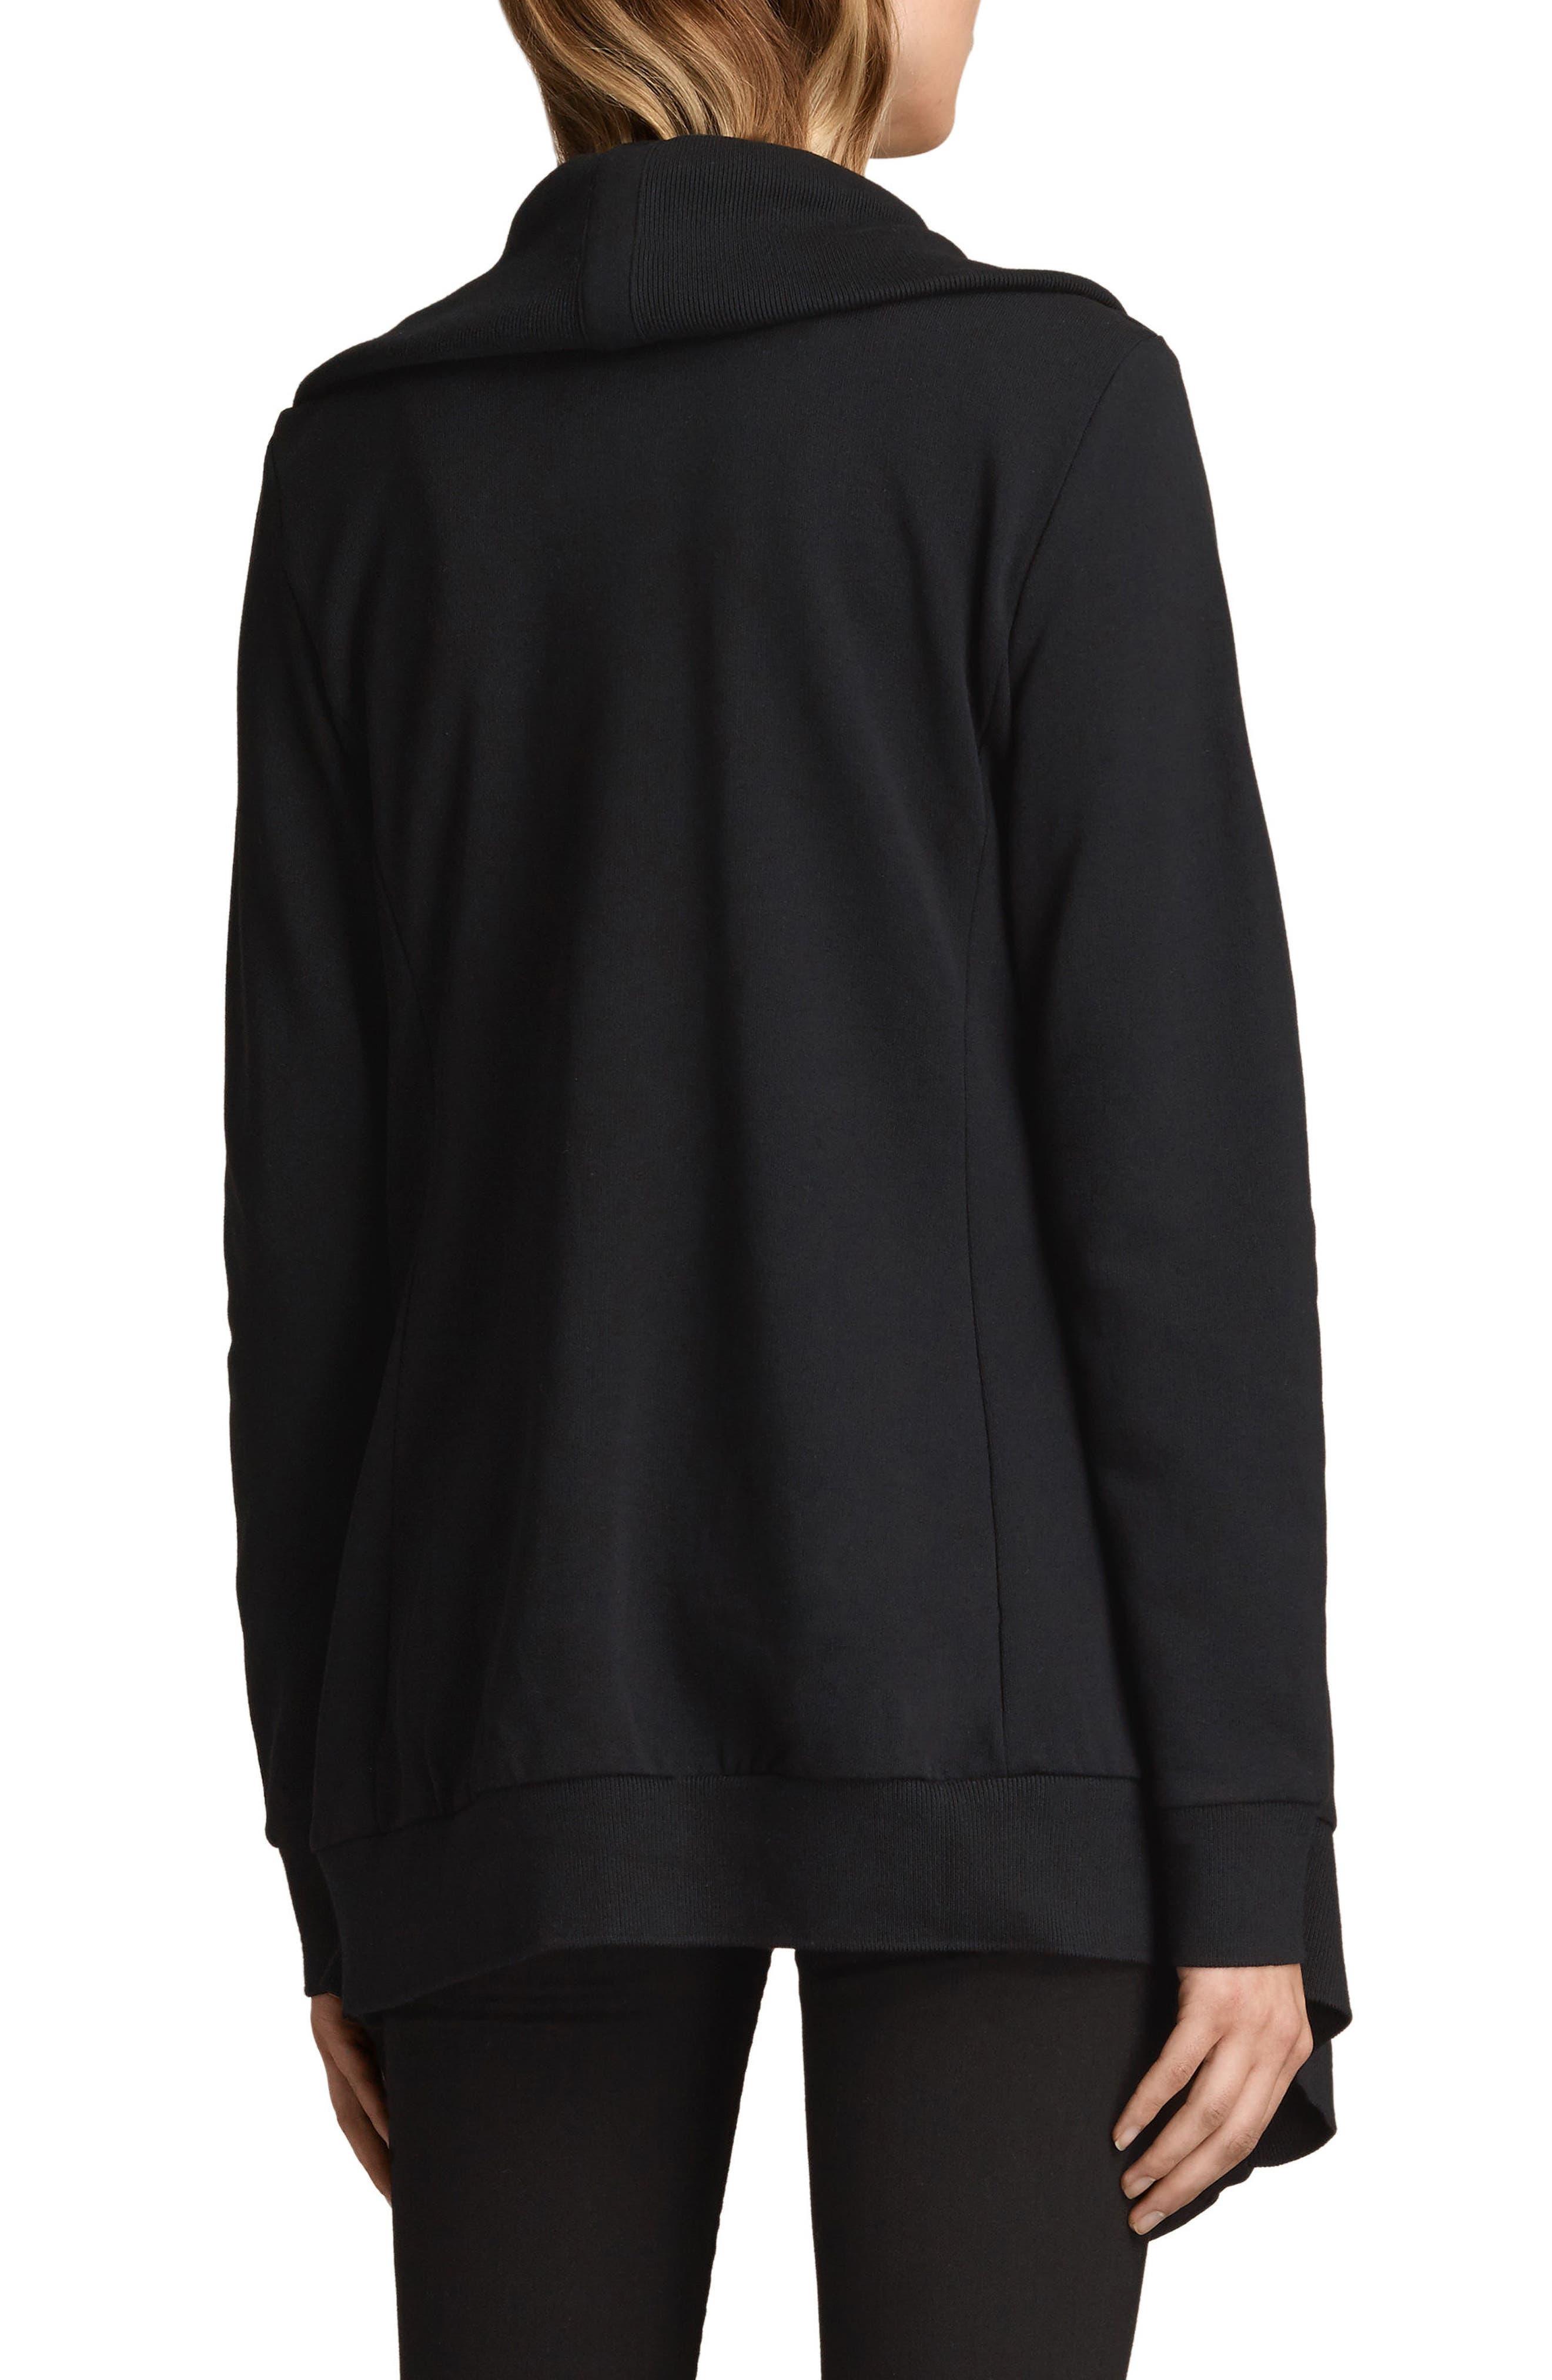 Dahlia Sweatshirt,                             Alternate thumbnail 2, color,                             Black